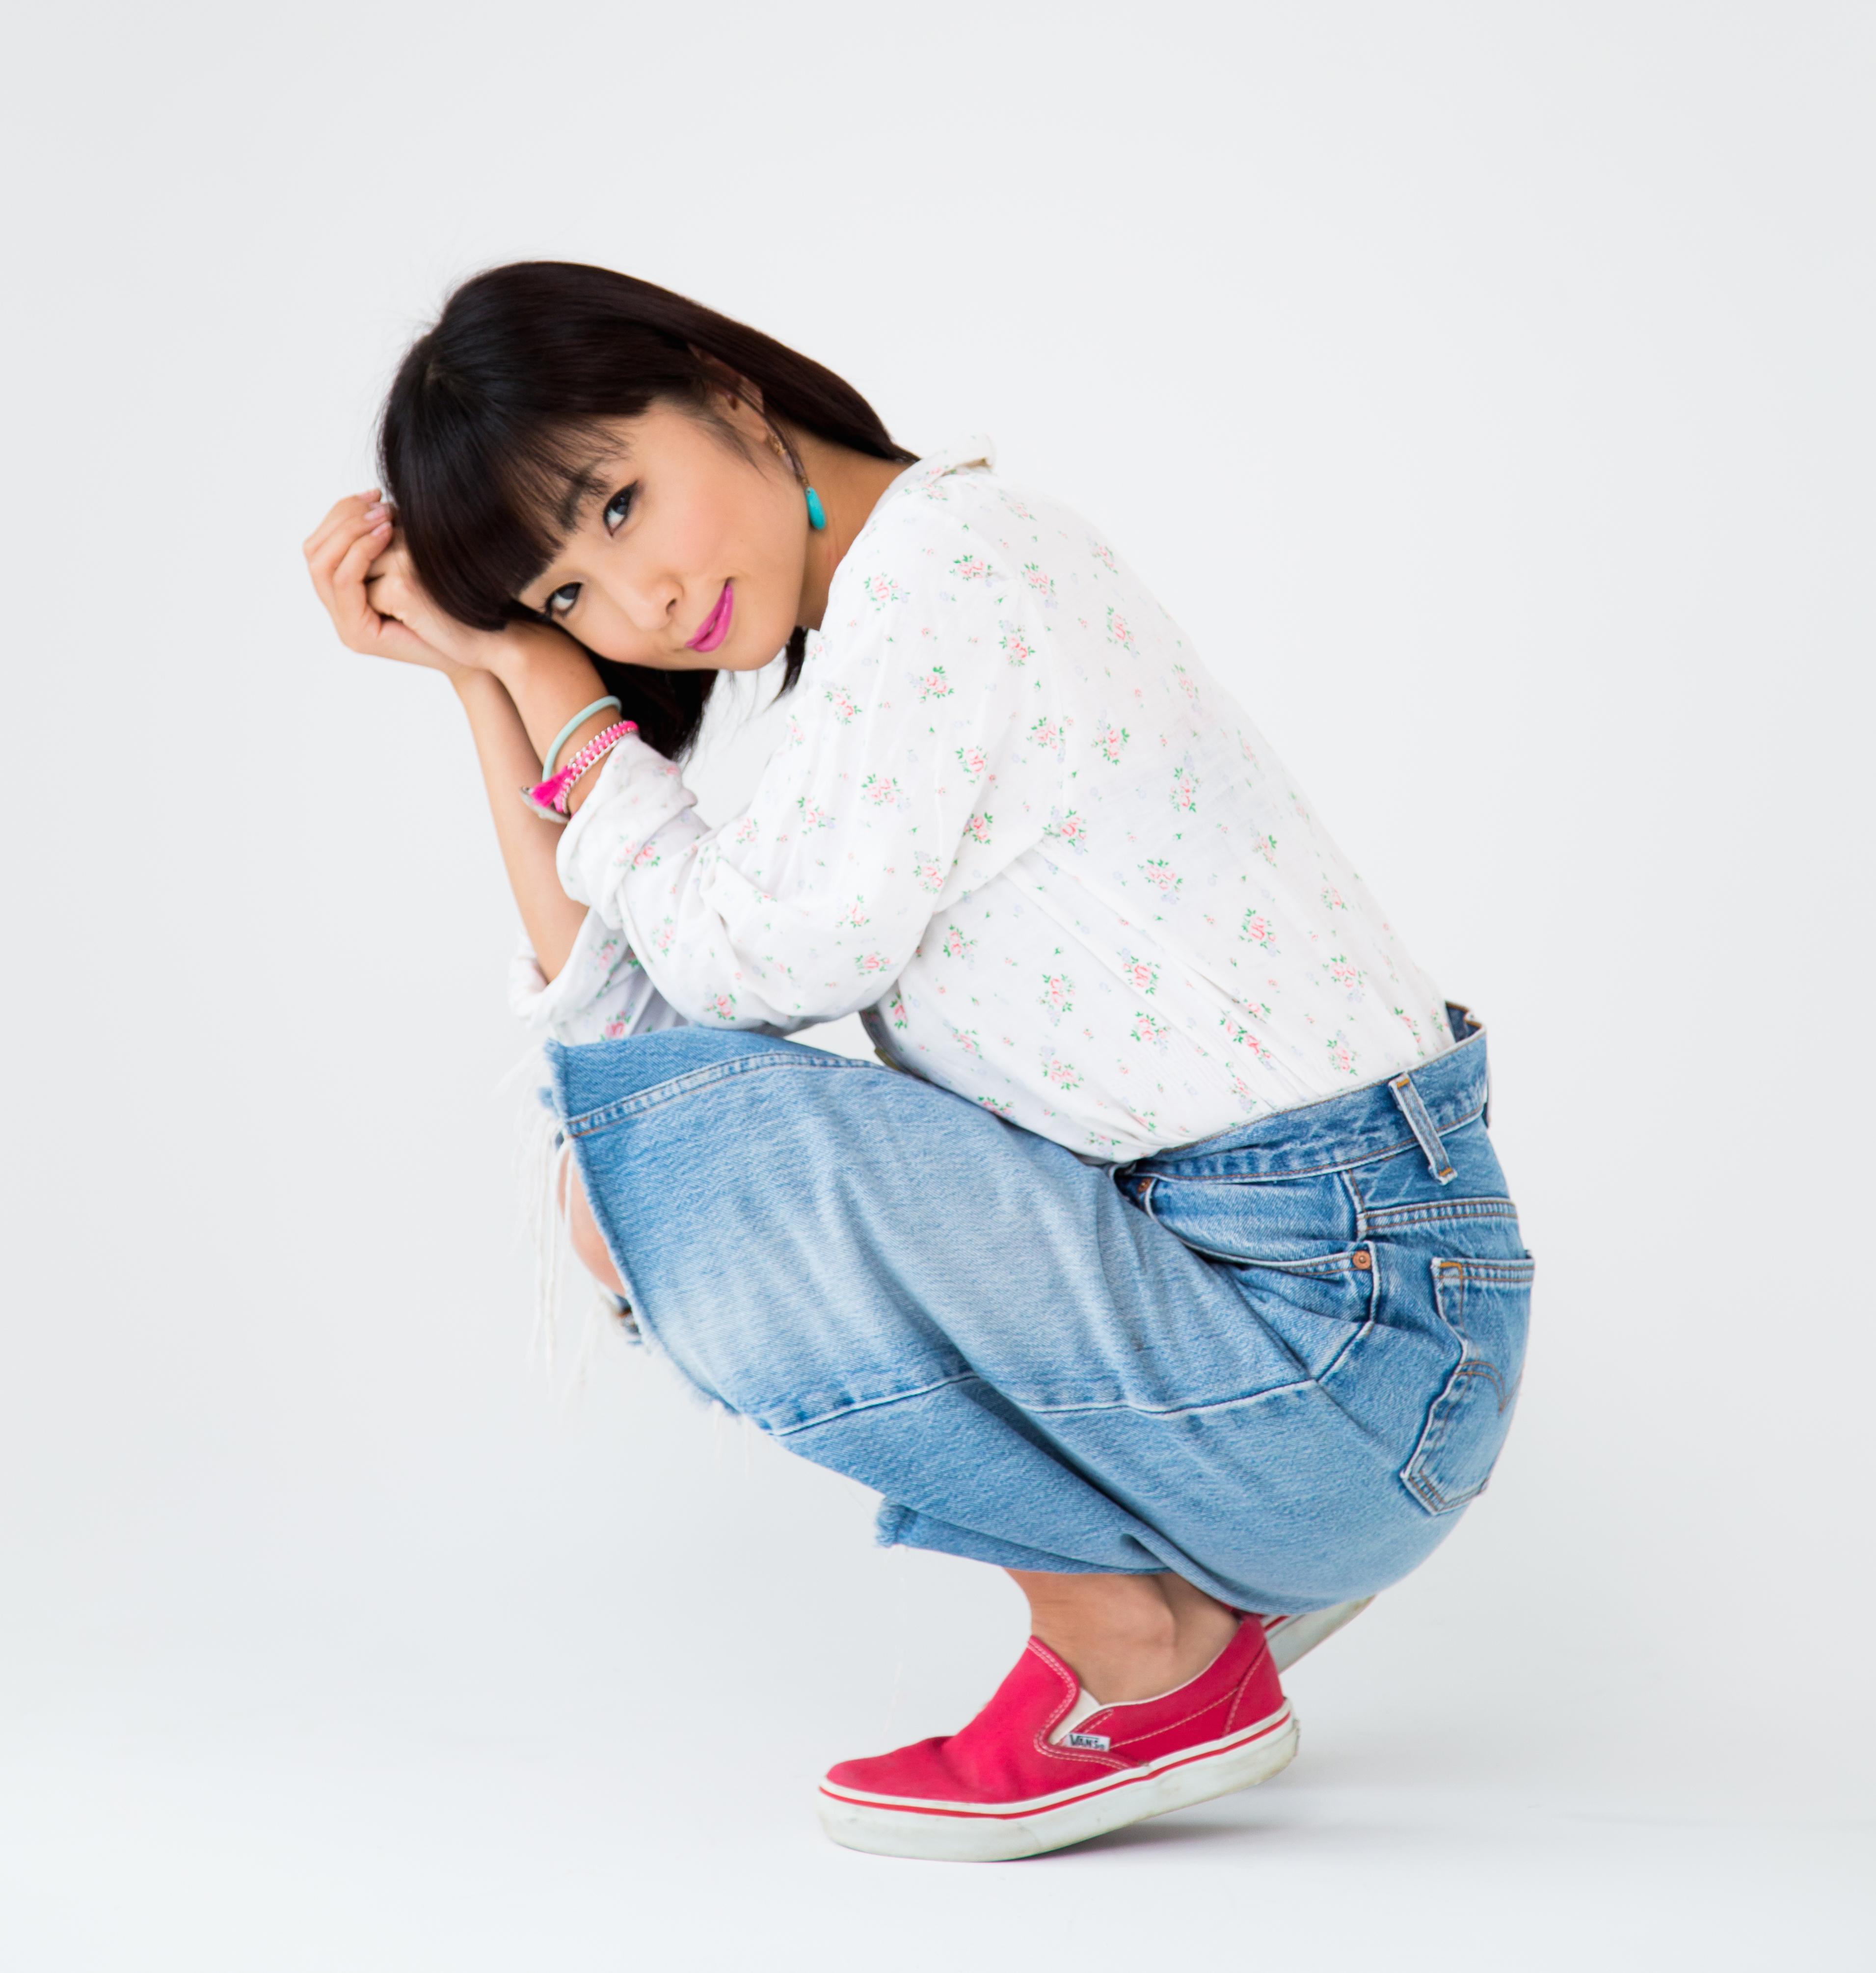 MEGUMIさん写真